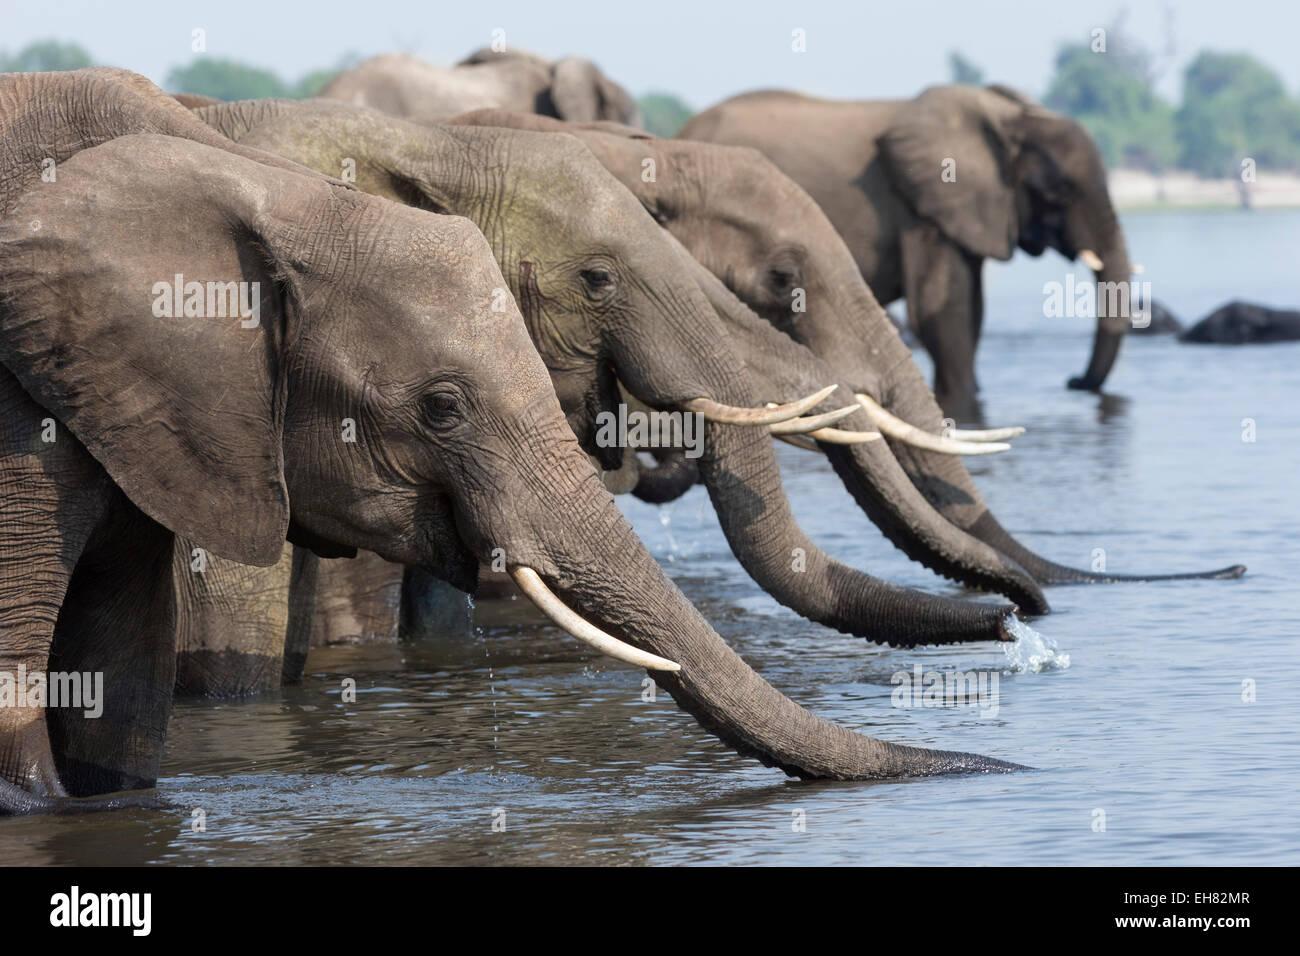 L'elefante africano (Loxodonta africana) bere, Chobe National Park, Botswana, Africa Immagini Stock